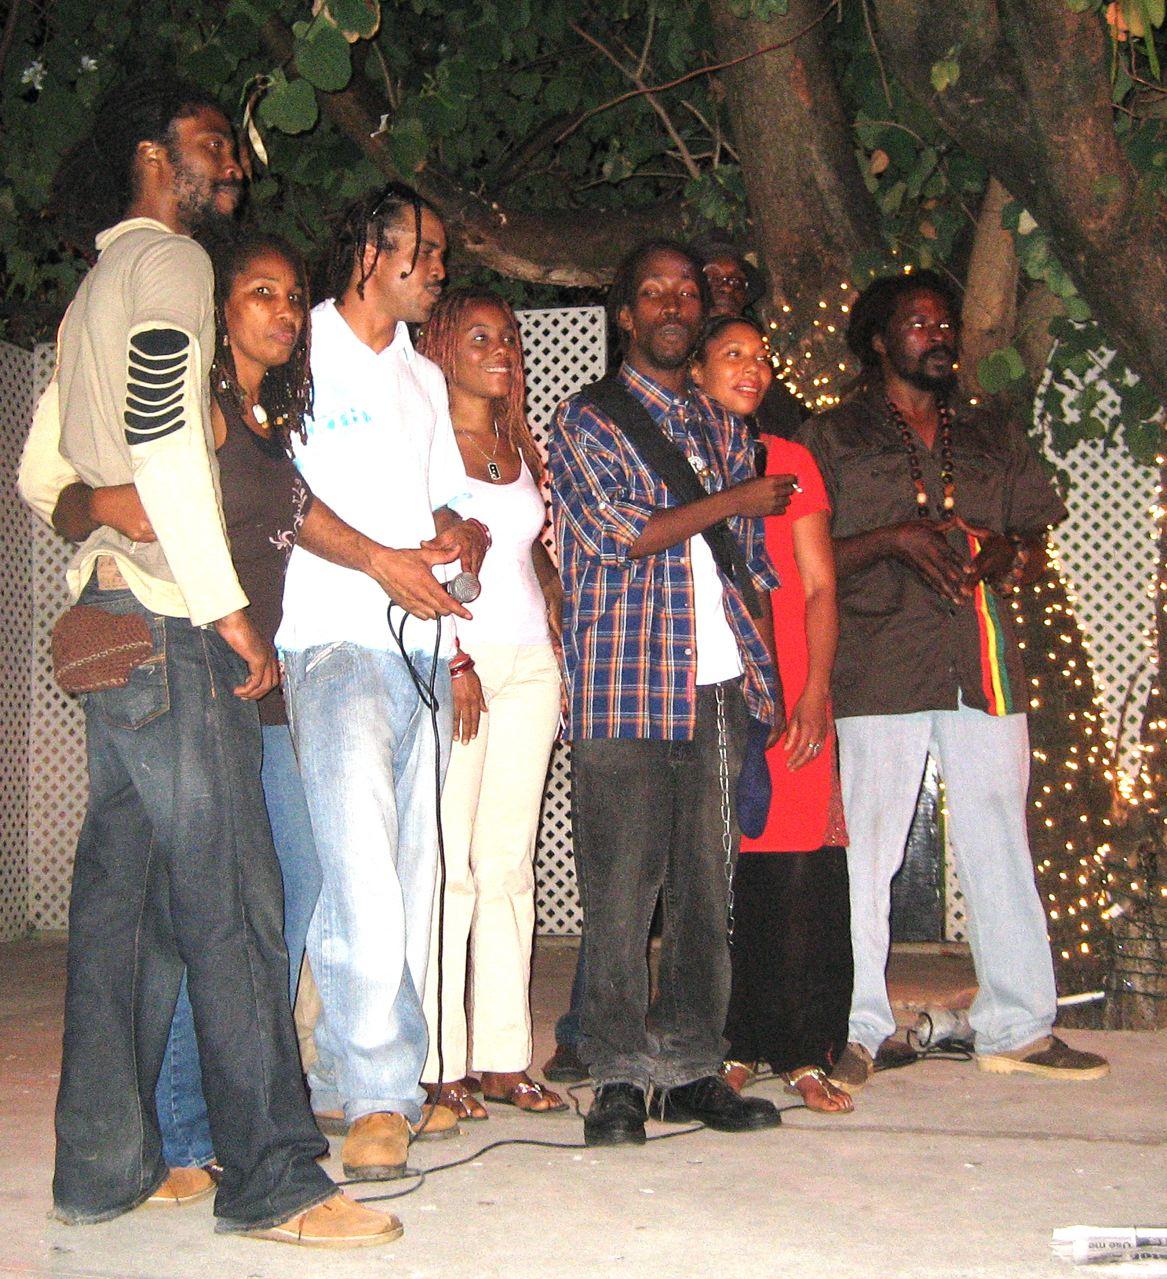 Dub poets group